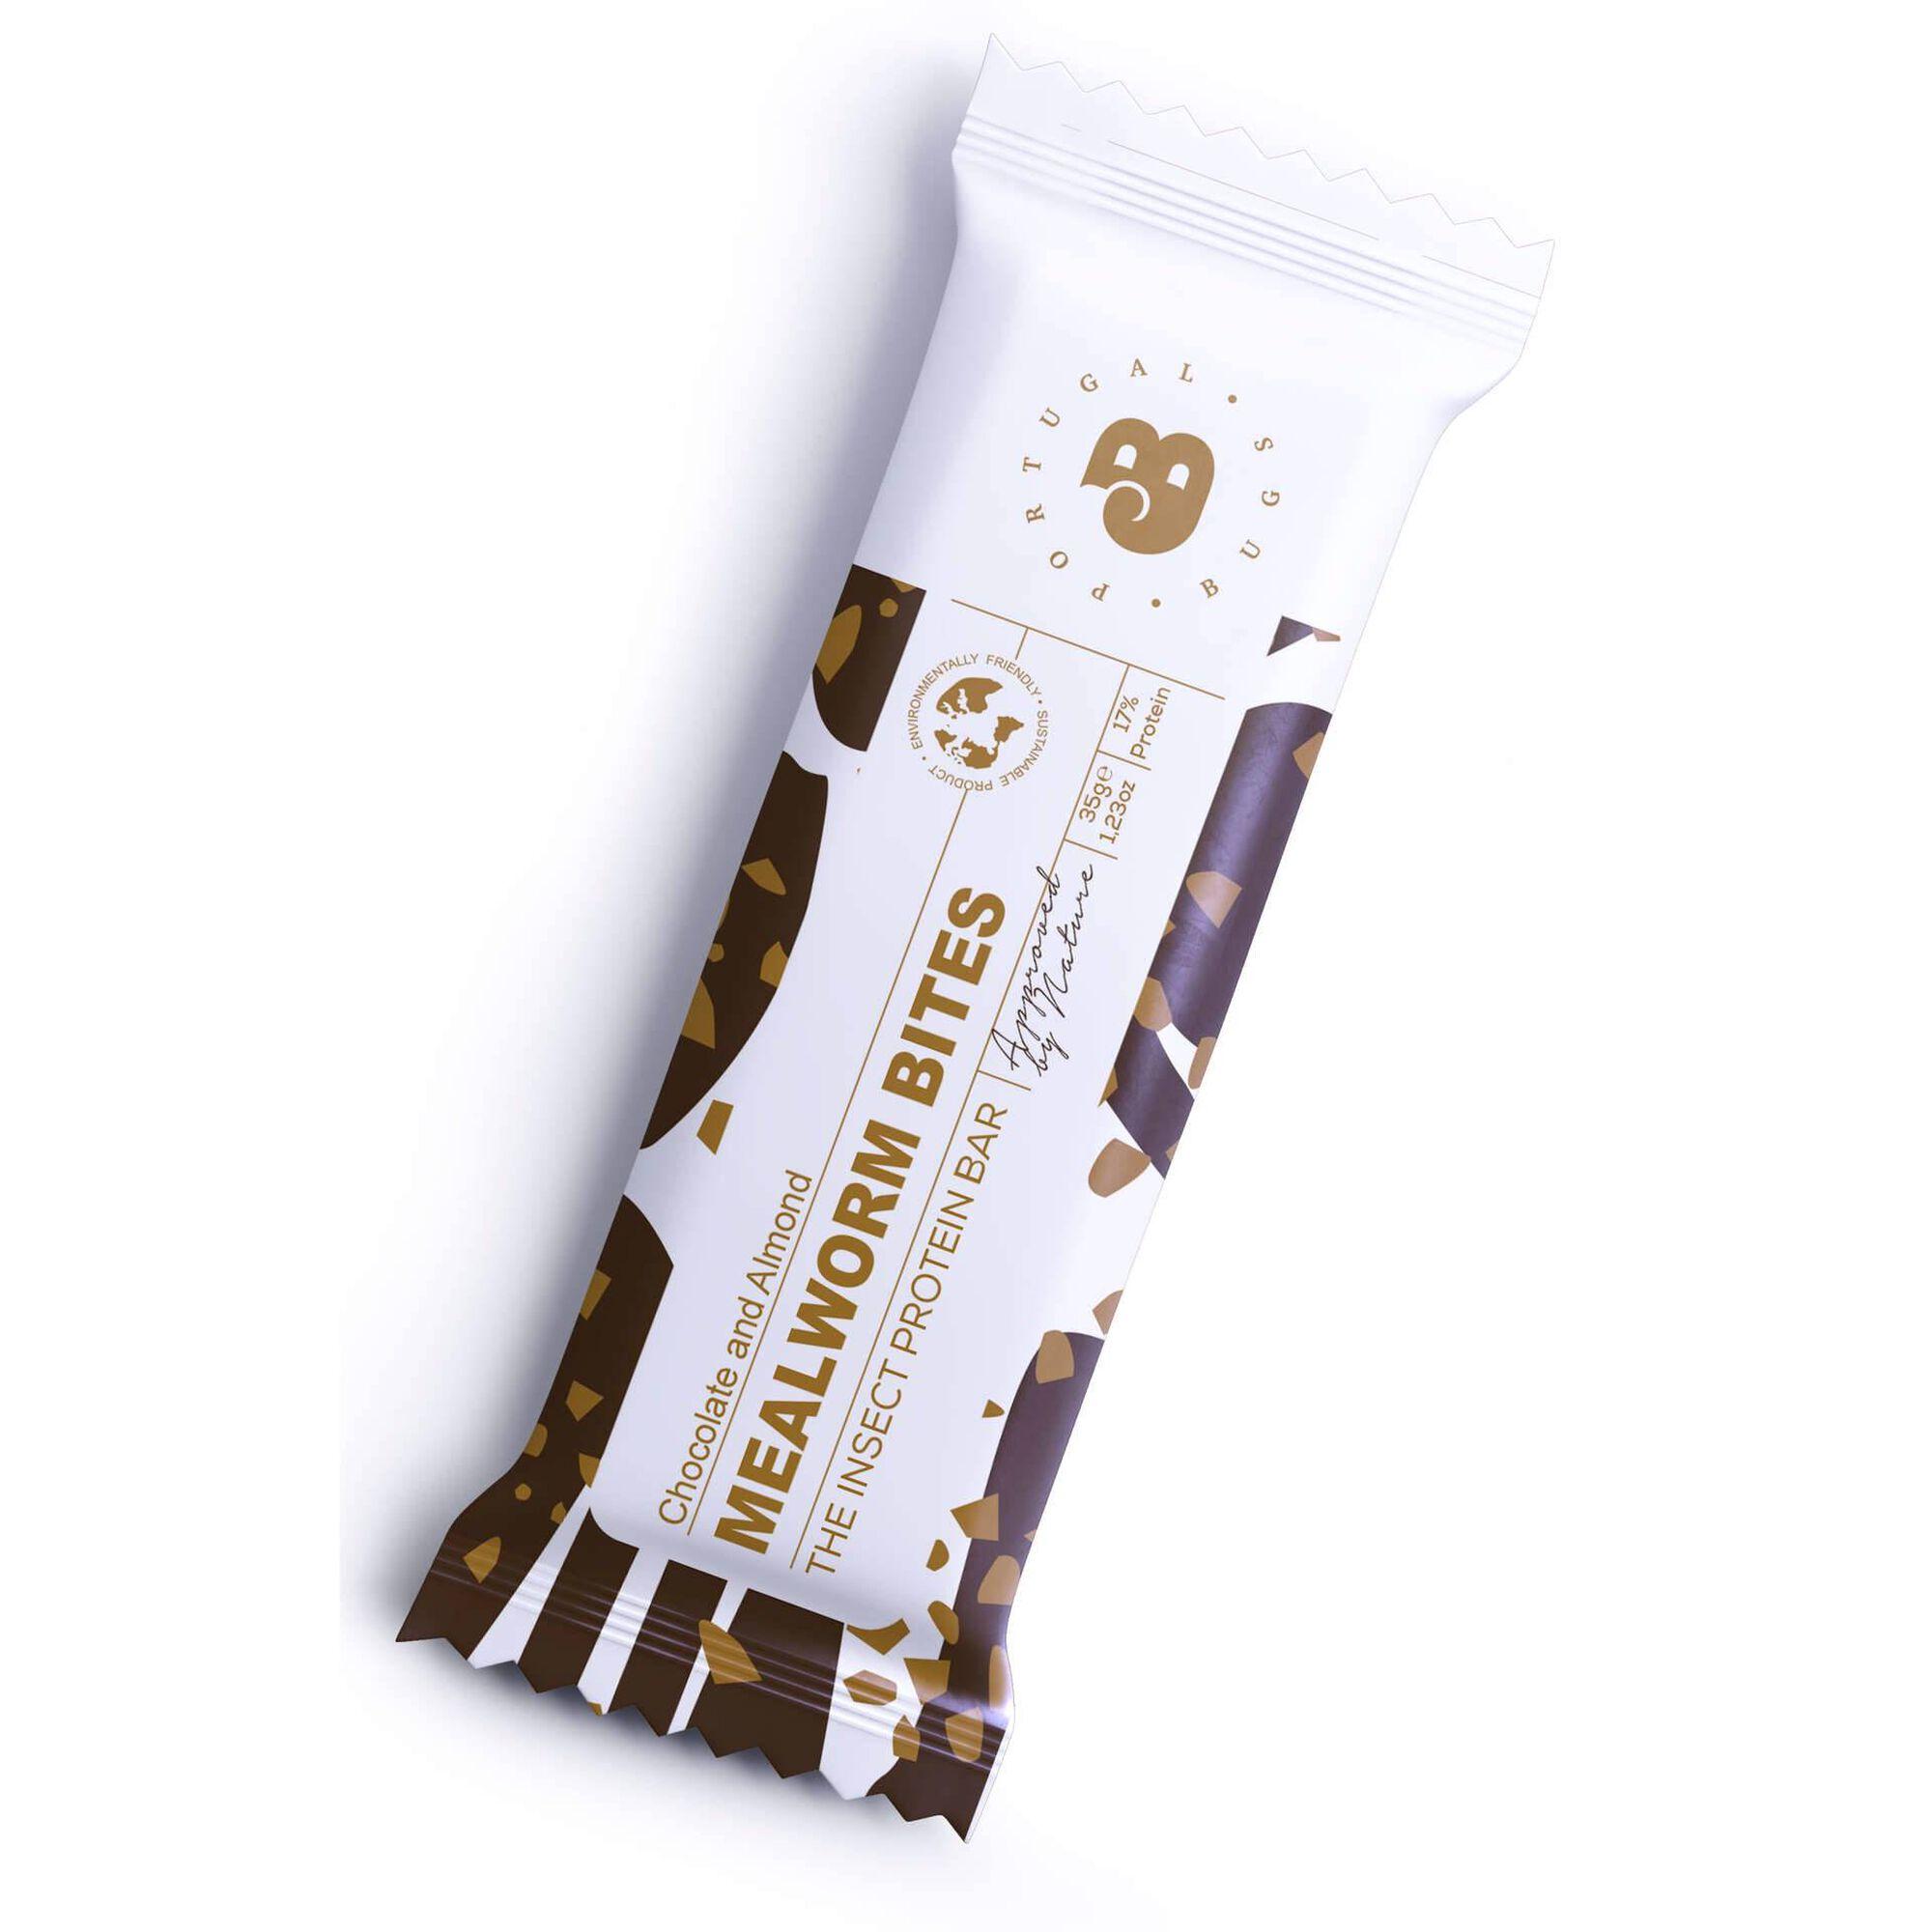 Barra Proteica Tenebrio, Chocolate e Amêndoa Mealworm Bites